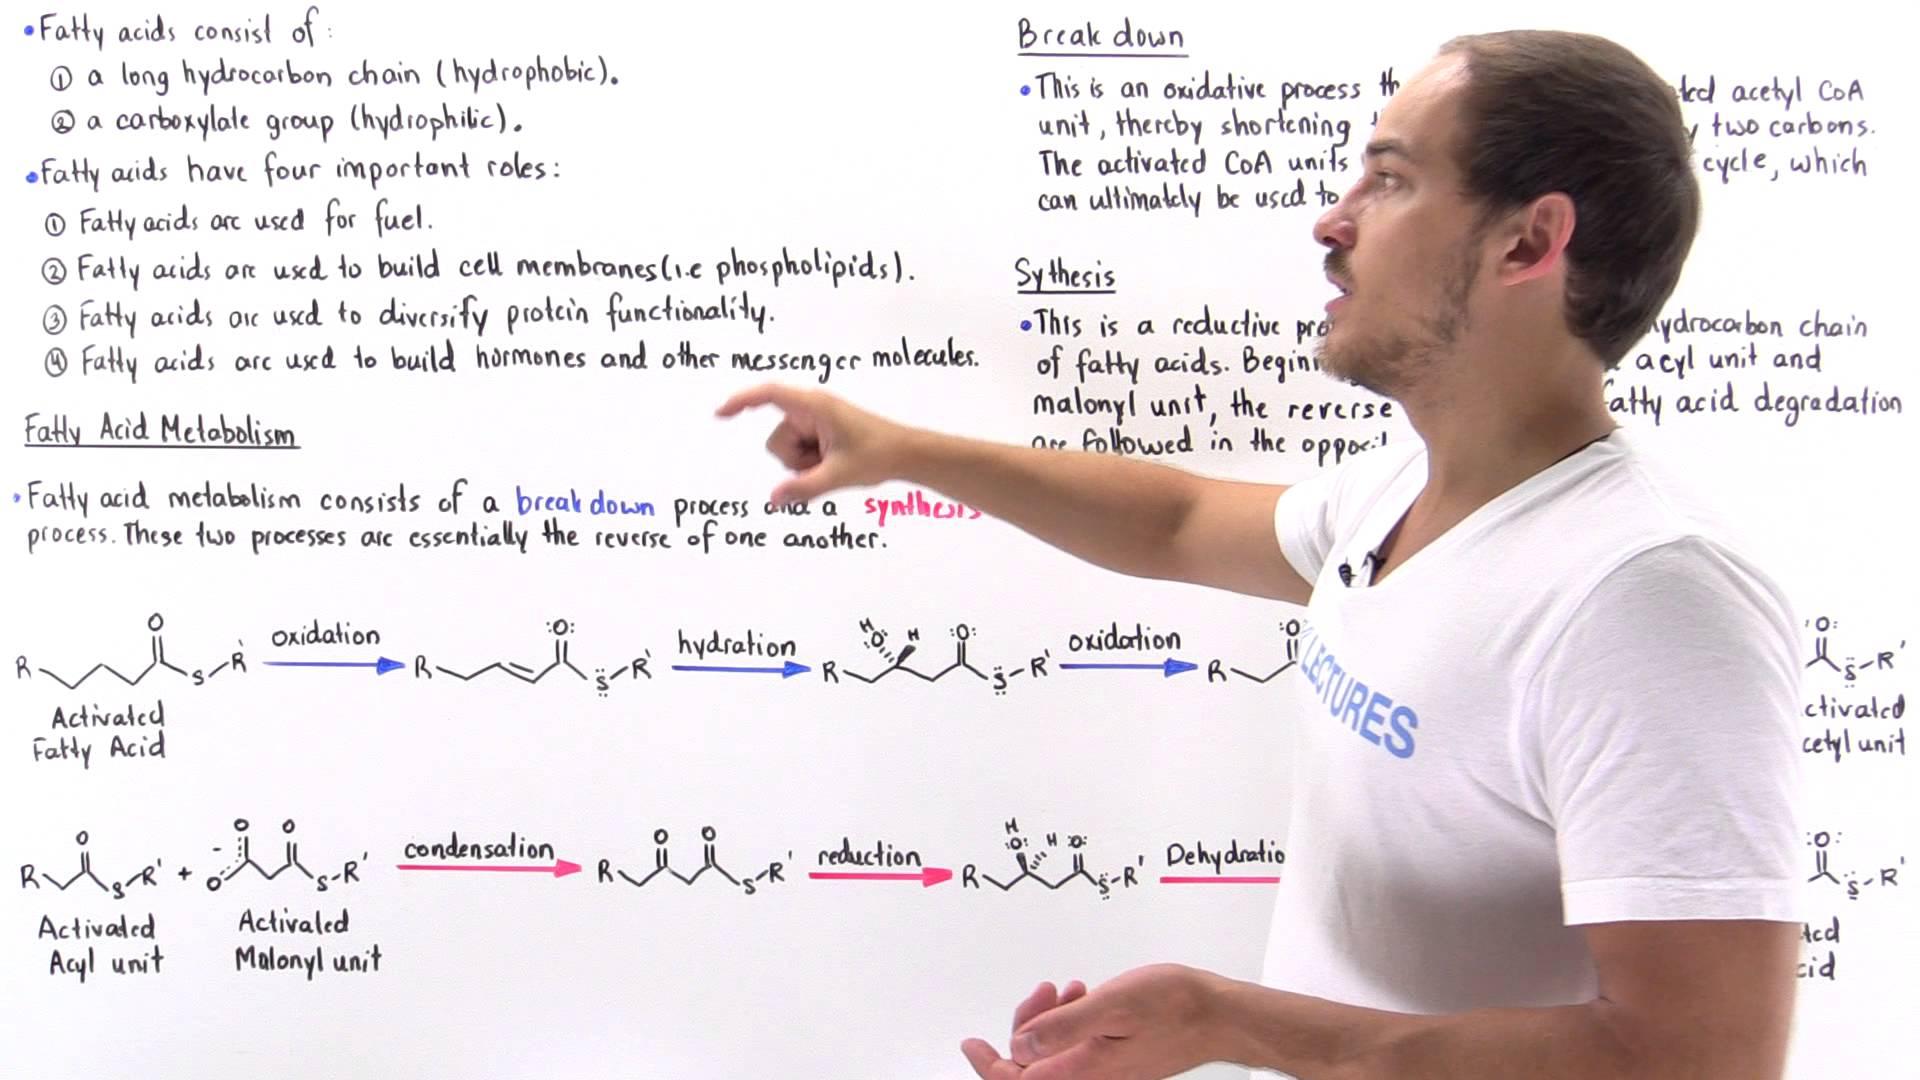 Introduction To Fatty Acid Metabolism